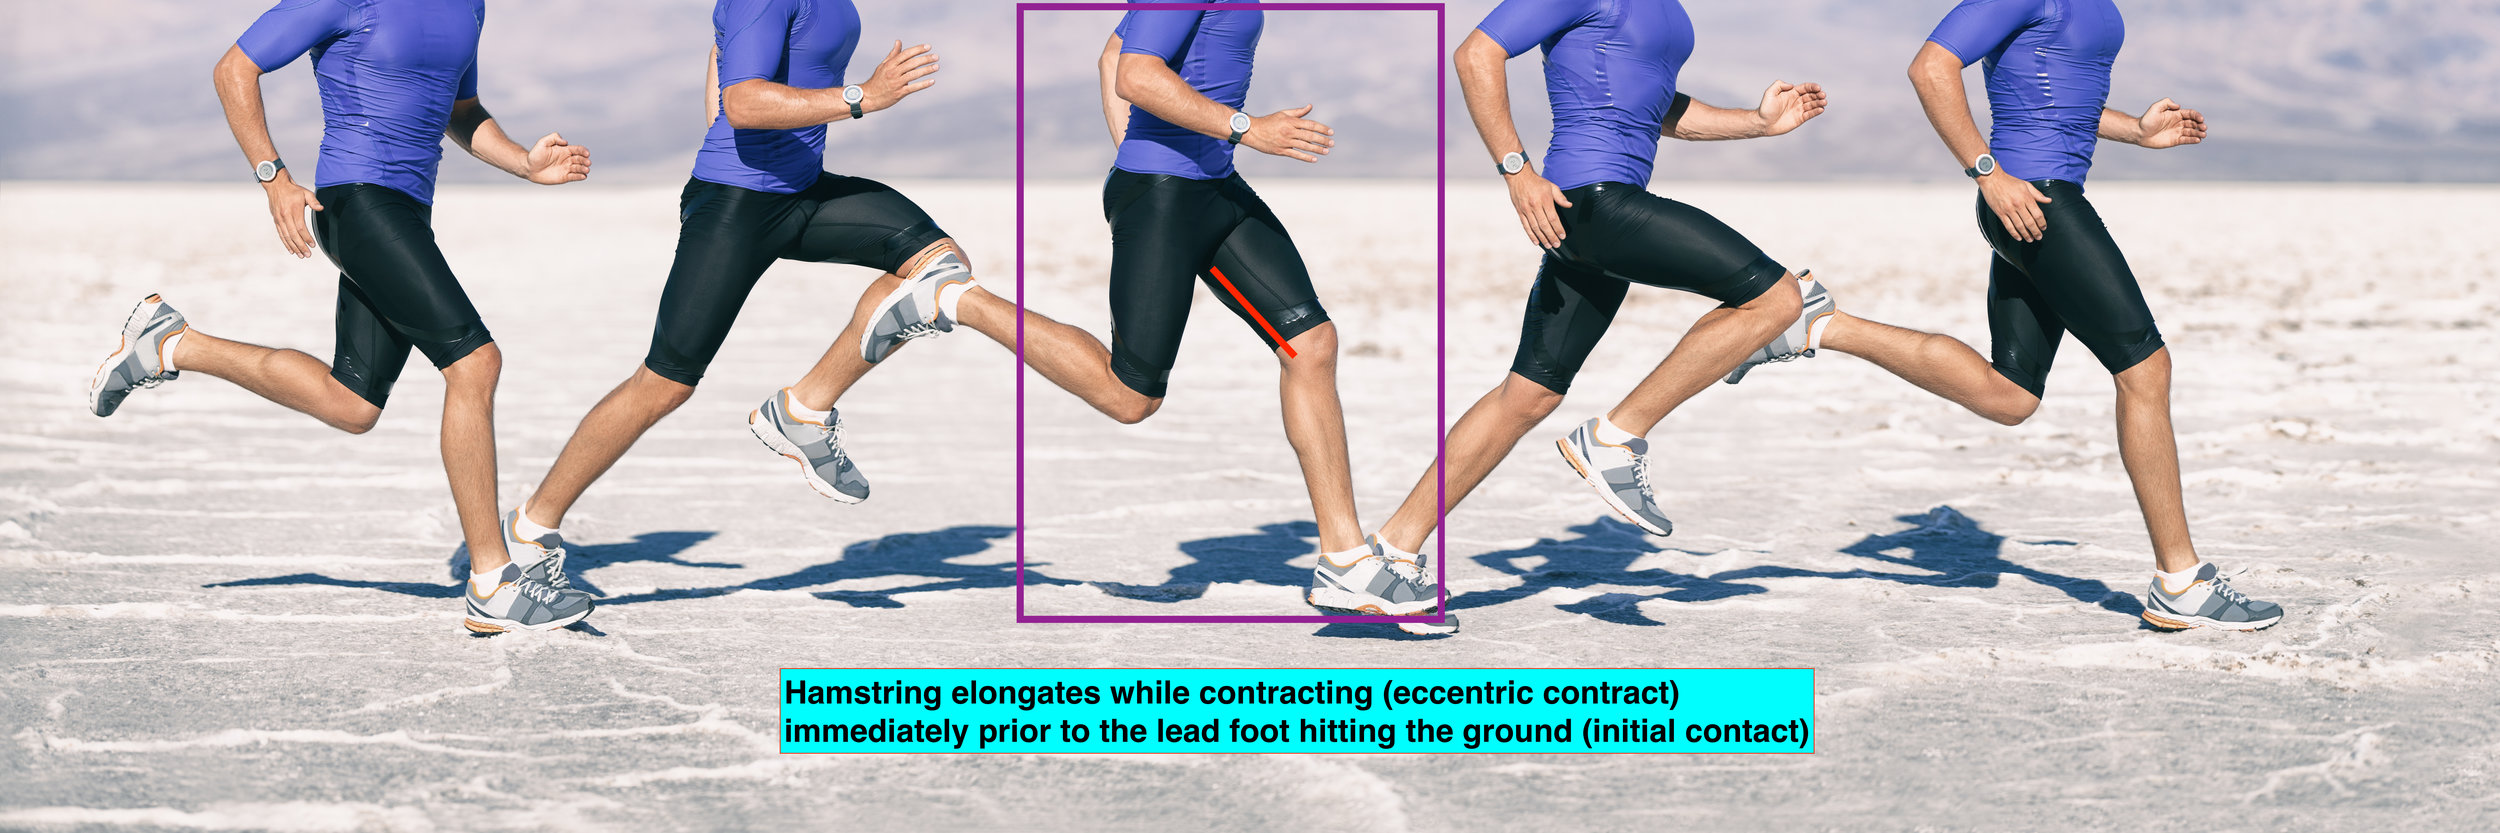 Running gait biomechanics eccentric HS.jpeg